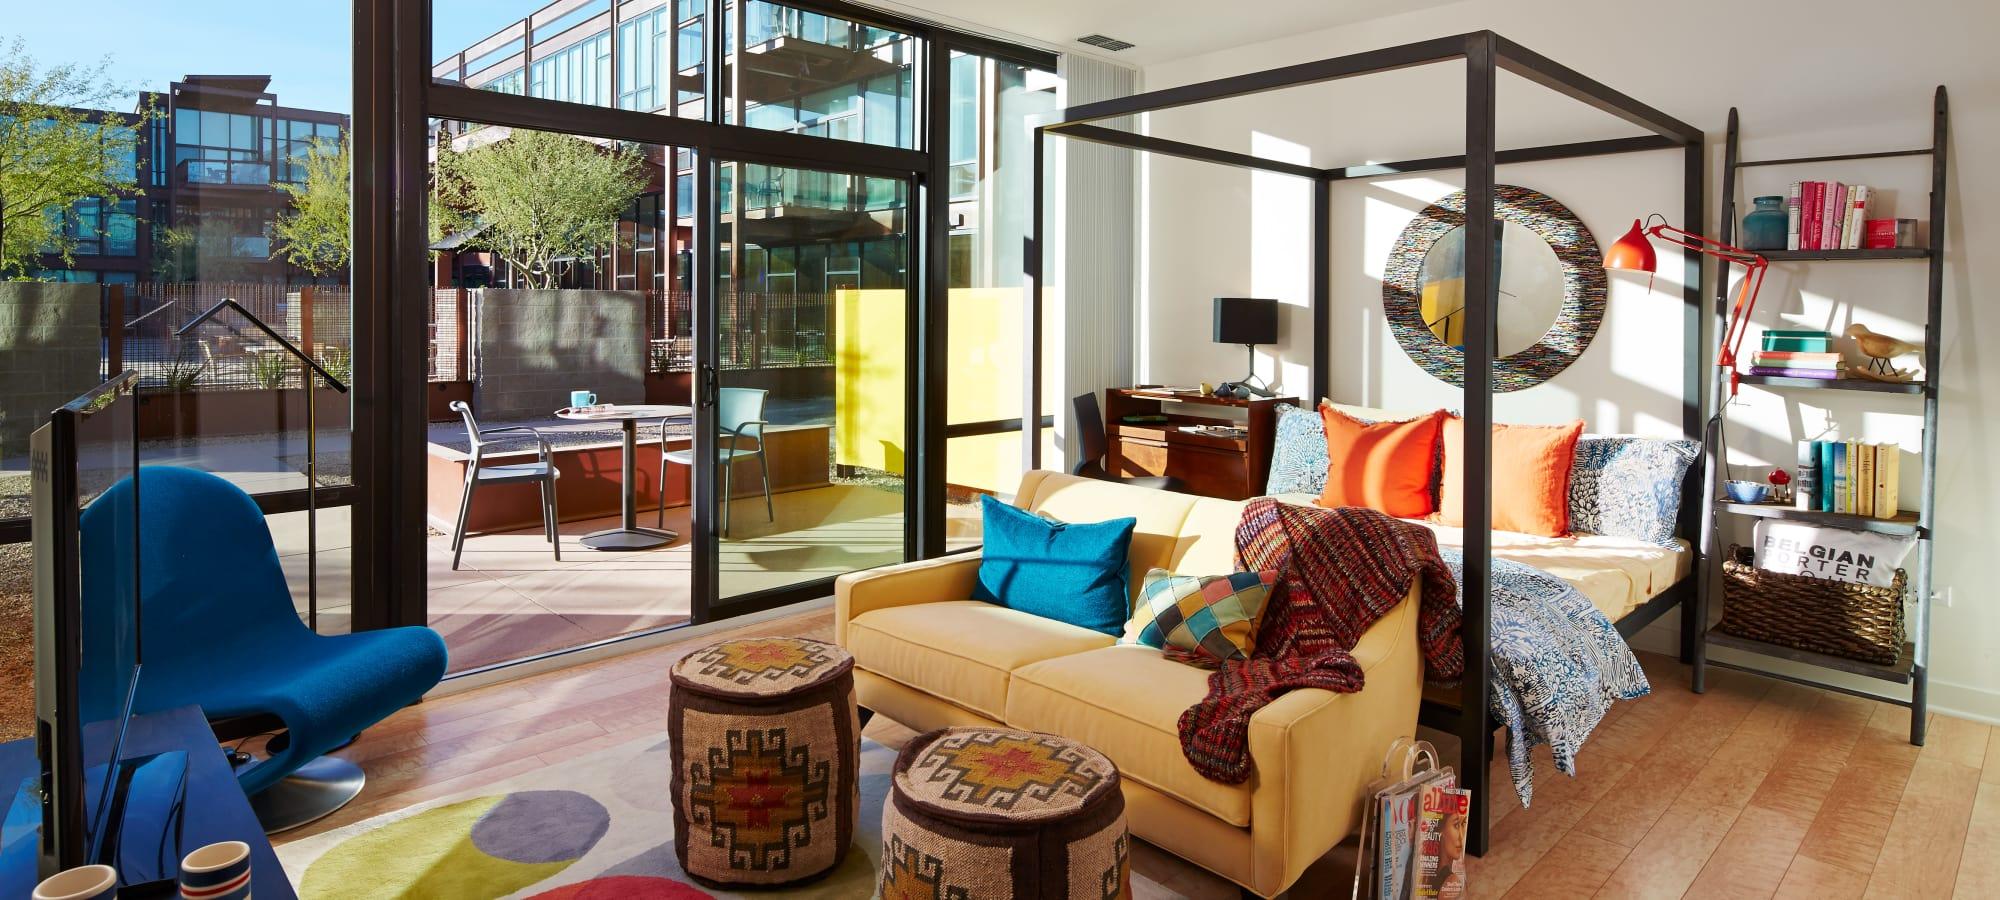 Open-concept living area in model home at Domus in Phoenix, Arizona